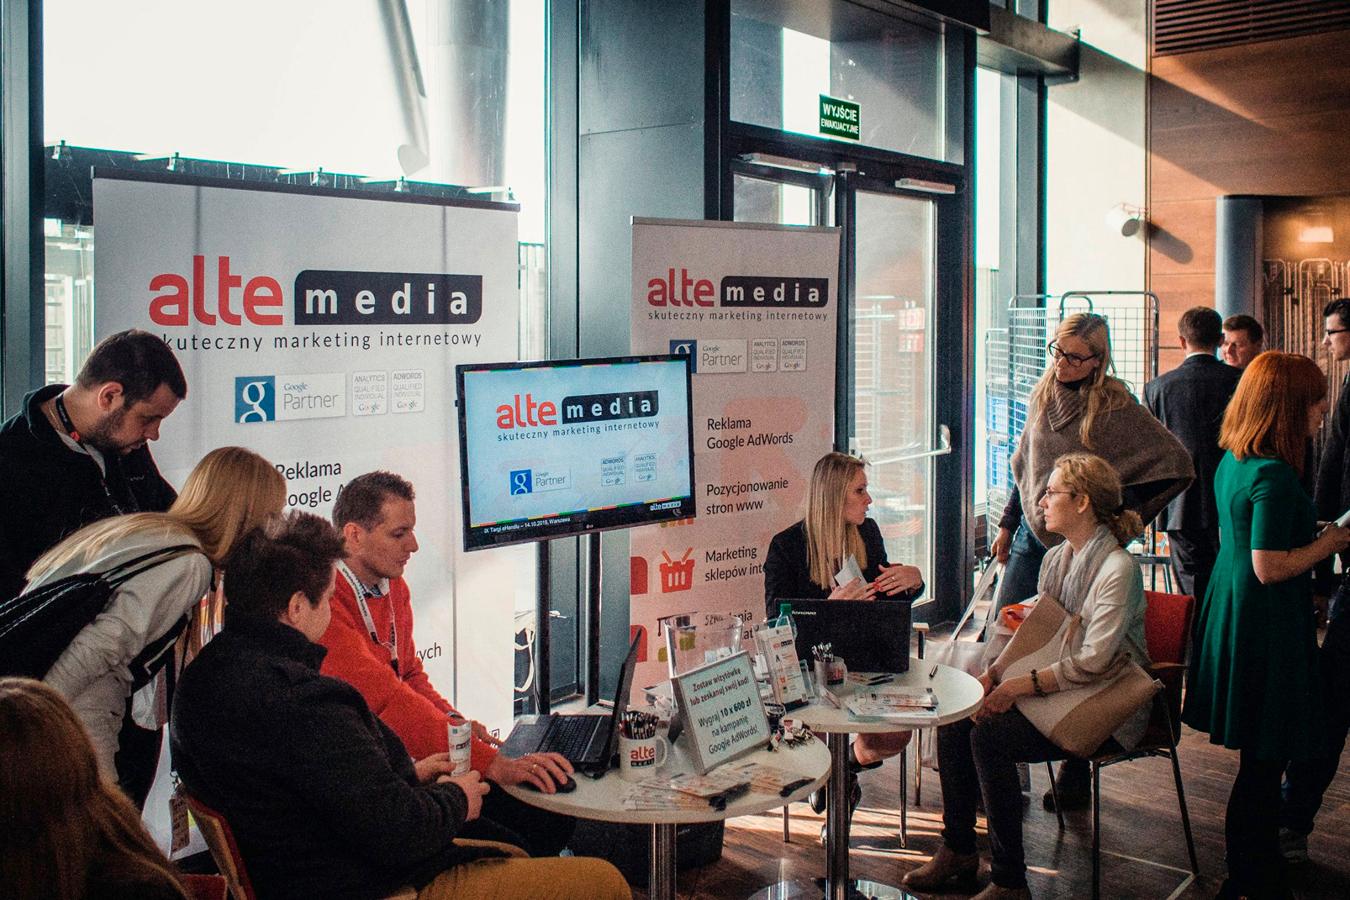 stoisko-Alte-Media